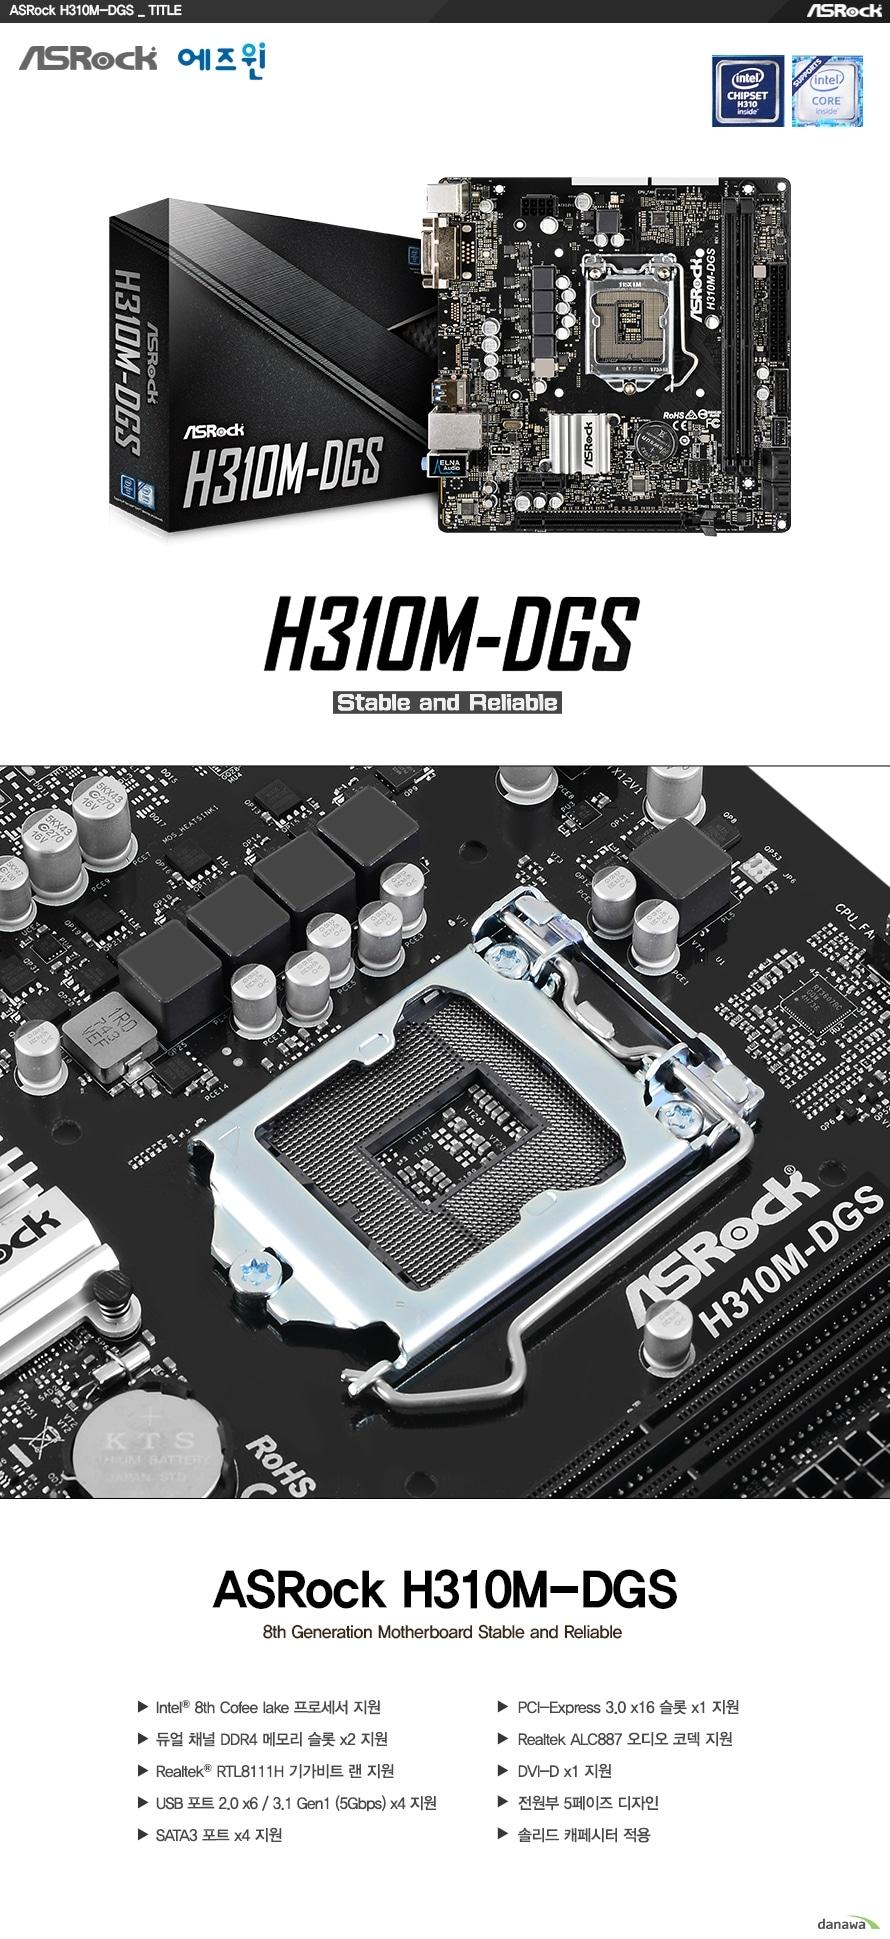 ASROCK H310M DGS  8세대 인텔 프로세서 지원 LGA1151소켓  인텔 H310 칩셋 지원  듀얼채널 DDR4 DIMM 메모리 지원 최대 32GB 메모리 지원 DDR4 2666 2400 2133 NON ECC UN BUFFERED 메모리 지원 XMP 2.0 지원  PCIE 3.0 X16 슬롯 1개  PCIE 2.0 X1 슬롯 1개  리얼텍 RTL8111H 기가비트 랜 지원  SATA3 커넥터 4개 지원  USB 3.0 4개 및 2.0 6개 지원  KC인증 R REM ASR H310MDGS  제조사의 사정에 따라 사전고지 없이 일부 제품사양이 변경될 수 있습니다. 구매 전 파워 서플라이의 CPU 프로세서 지원 여부를 확인하시기 바랍니다.  제품 구성   사용자 설명서 드라이버 CD IO쉴드  최고의 고객 만족을 위하여 에즈윈에서는 3년 무상 품질 보증 서비스를 제공합니다.